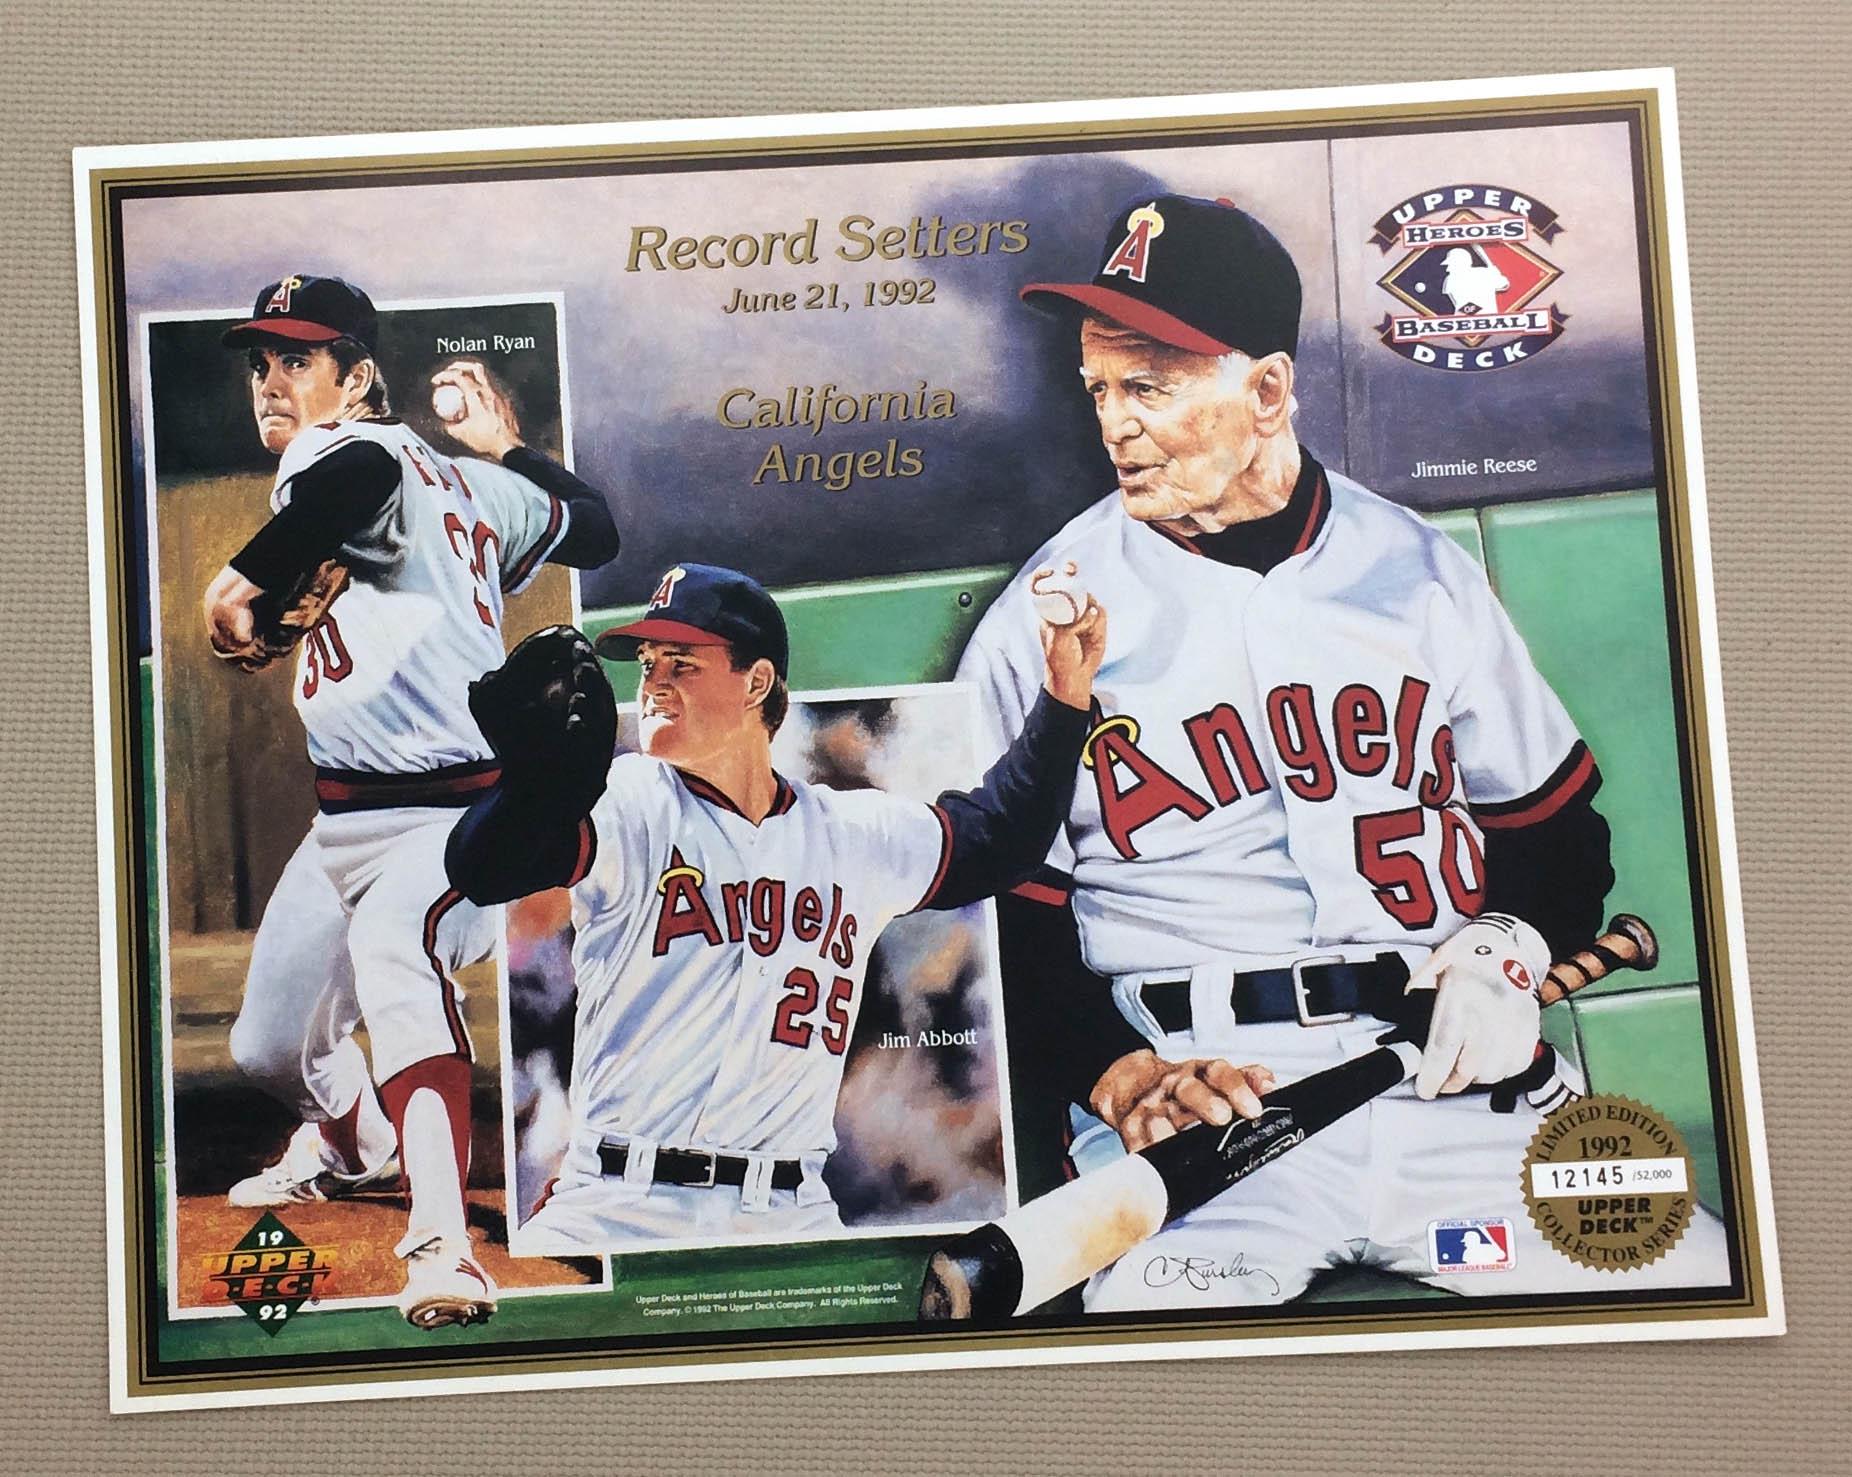 California Angels 1992 Record Setters